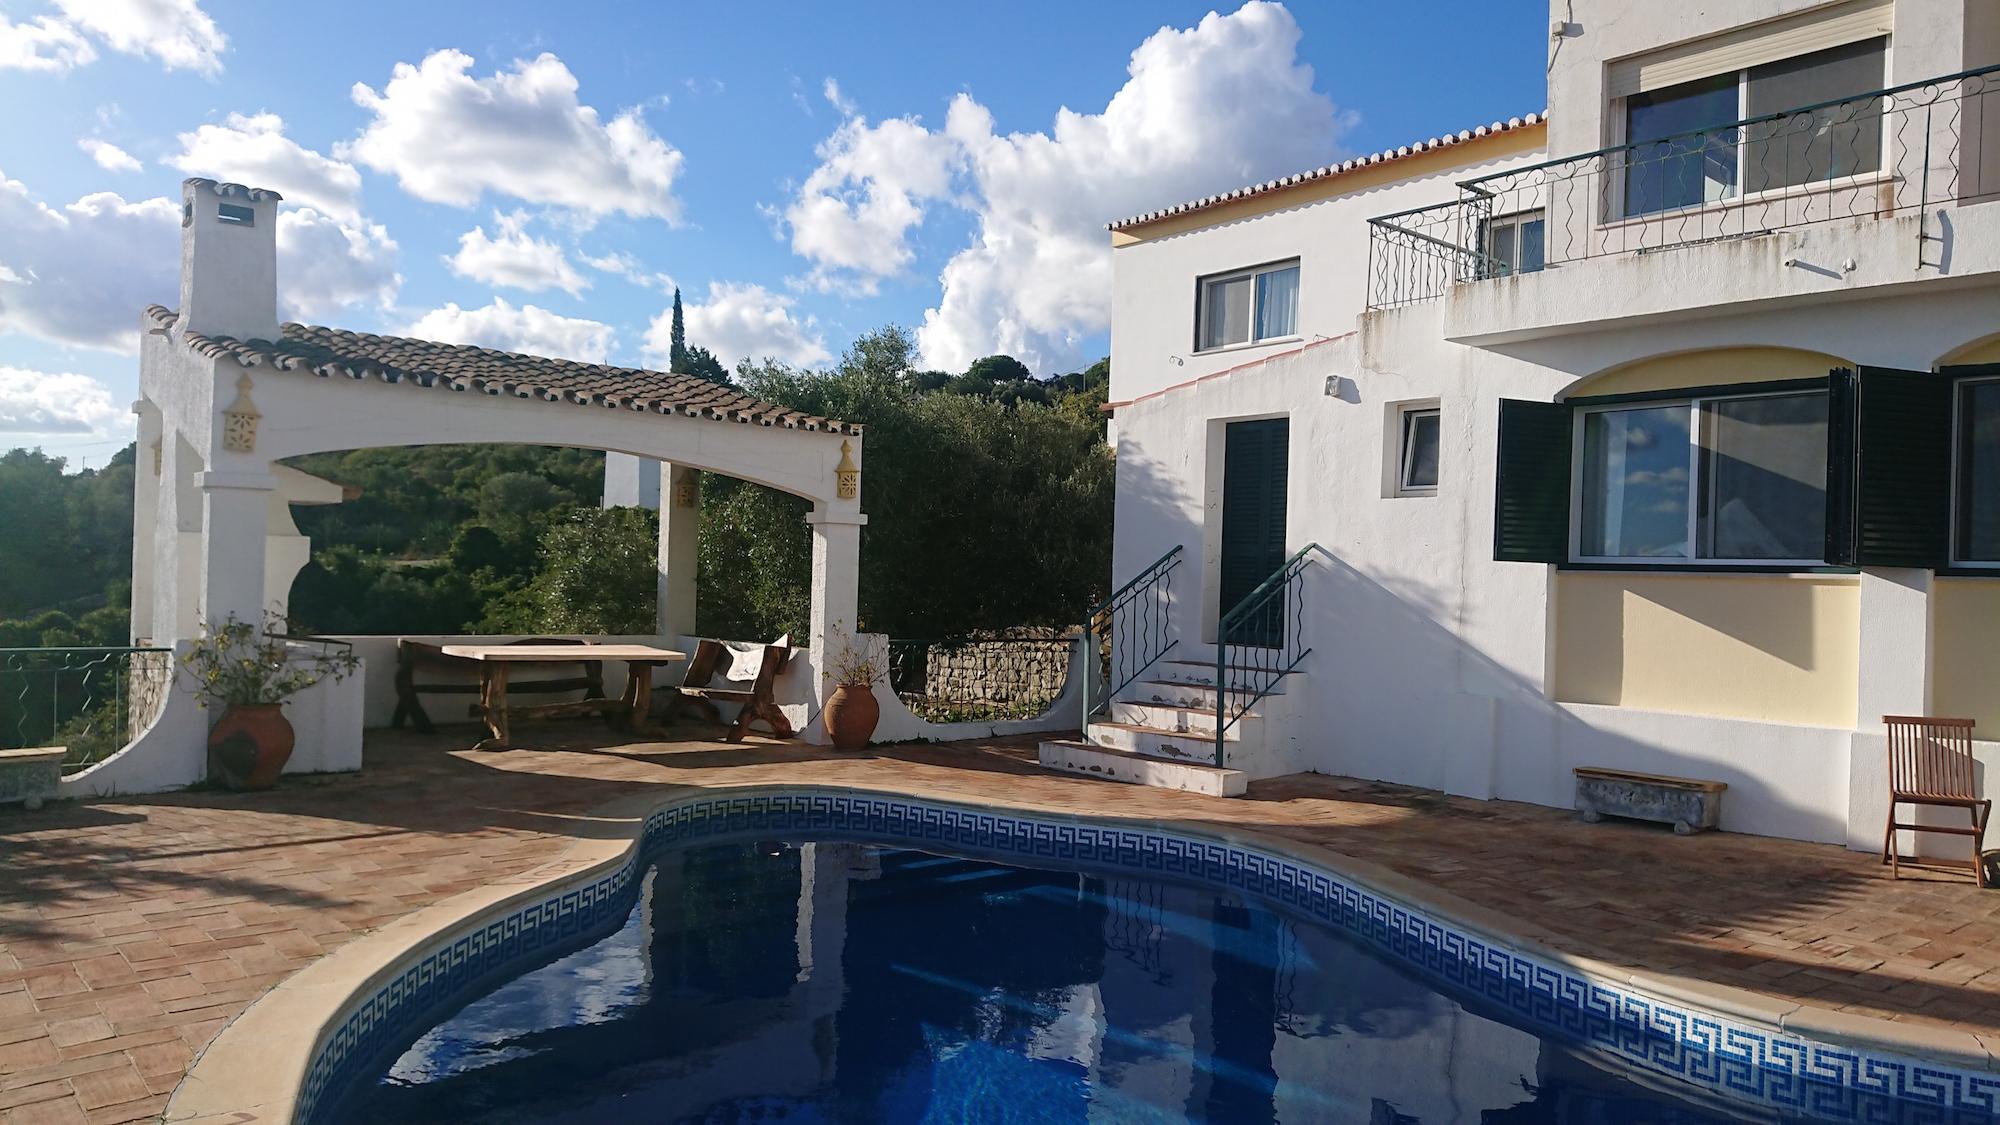 view of pool apt pool and bbq.jpg